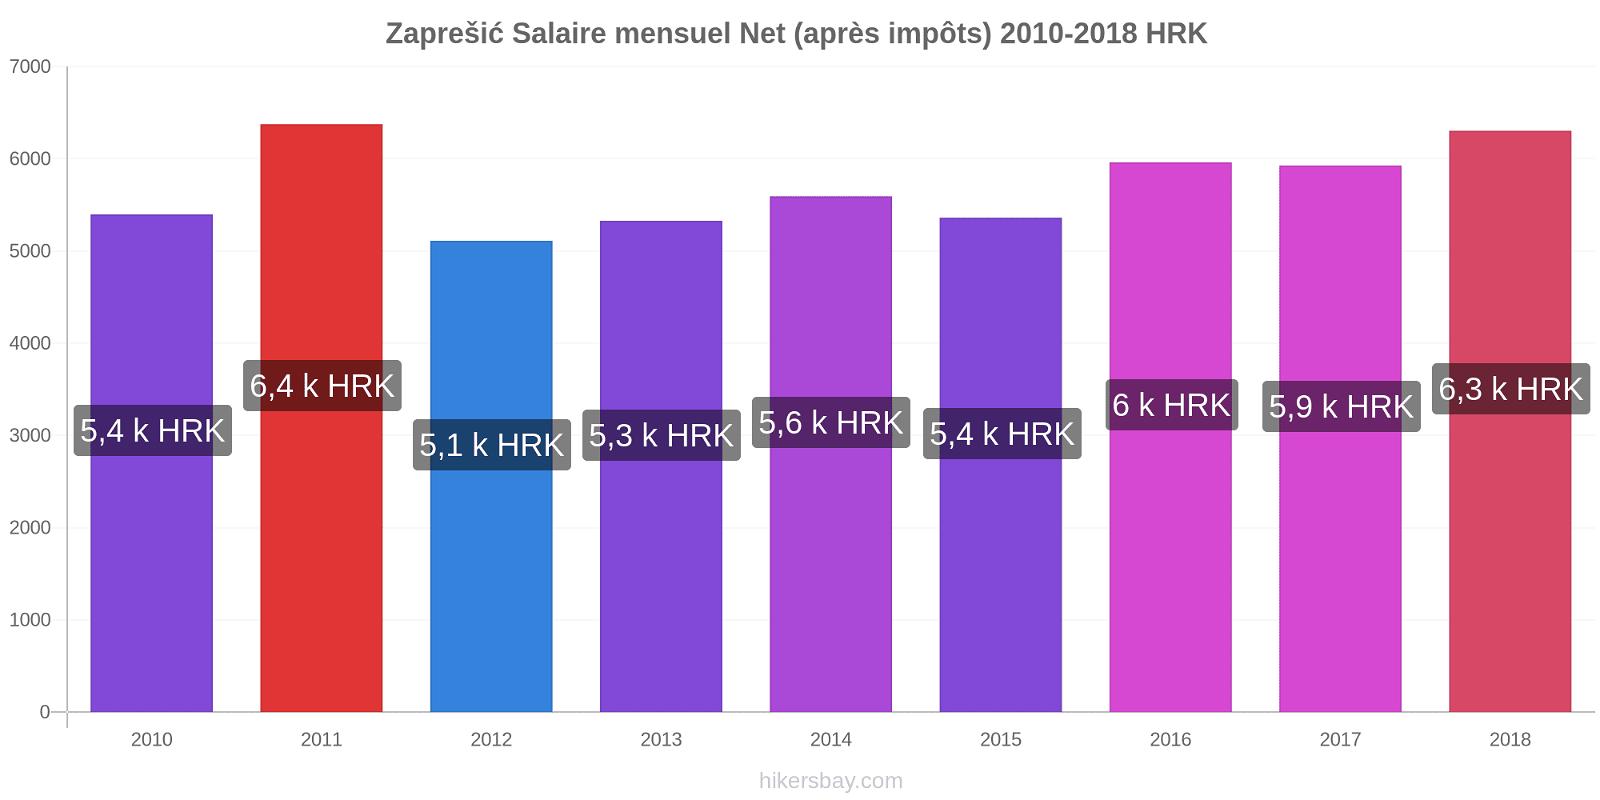 Zaprešić changements de prix Salaire mensuel Net (après impôts) hikersbay.com